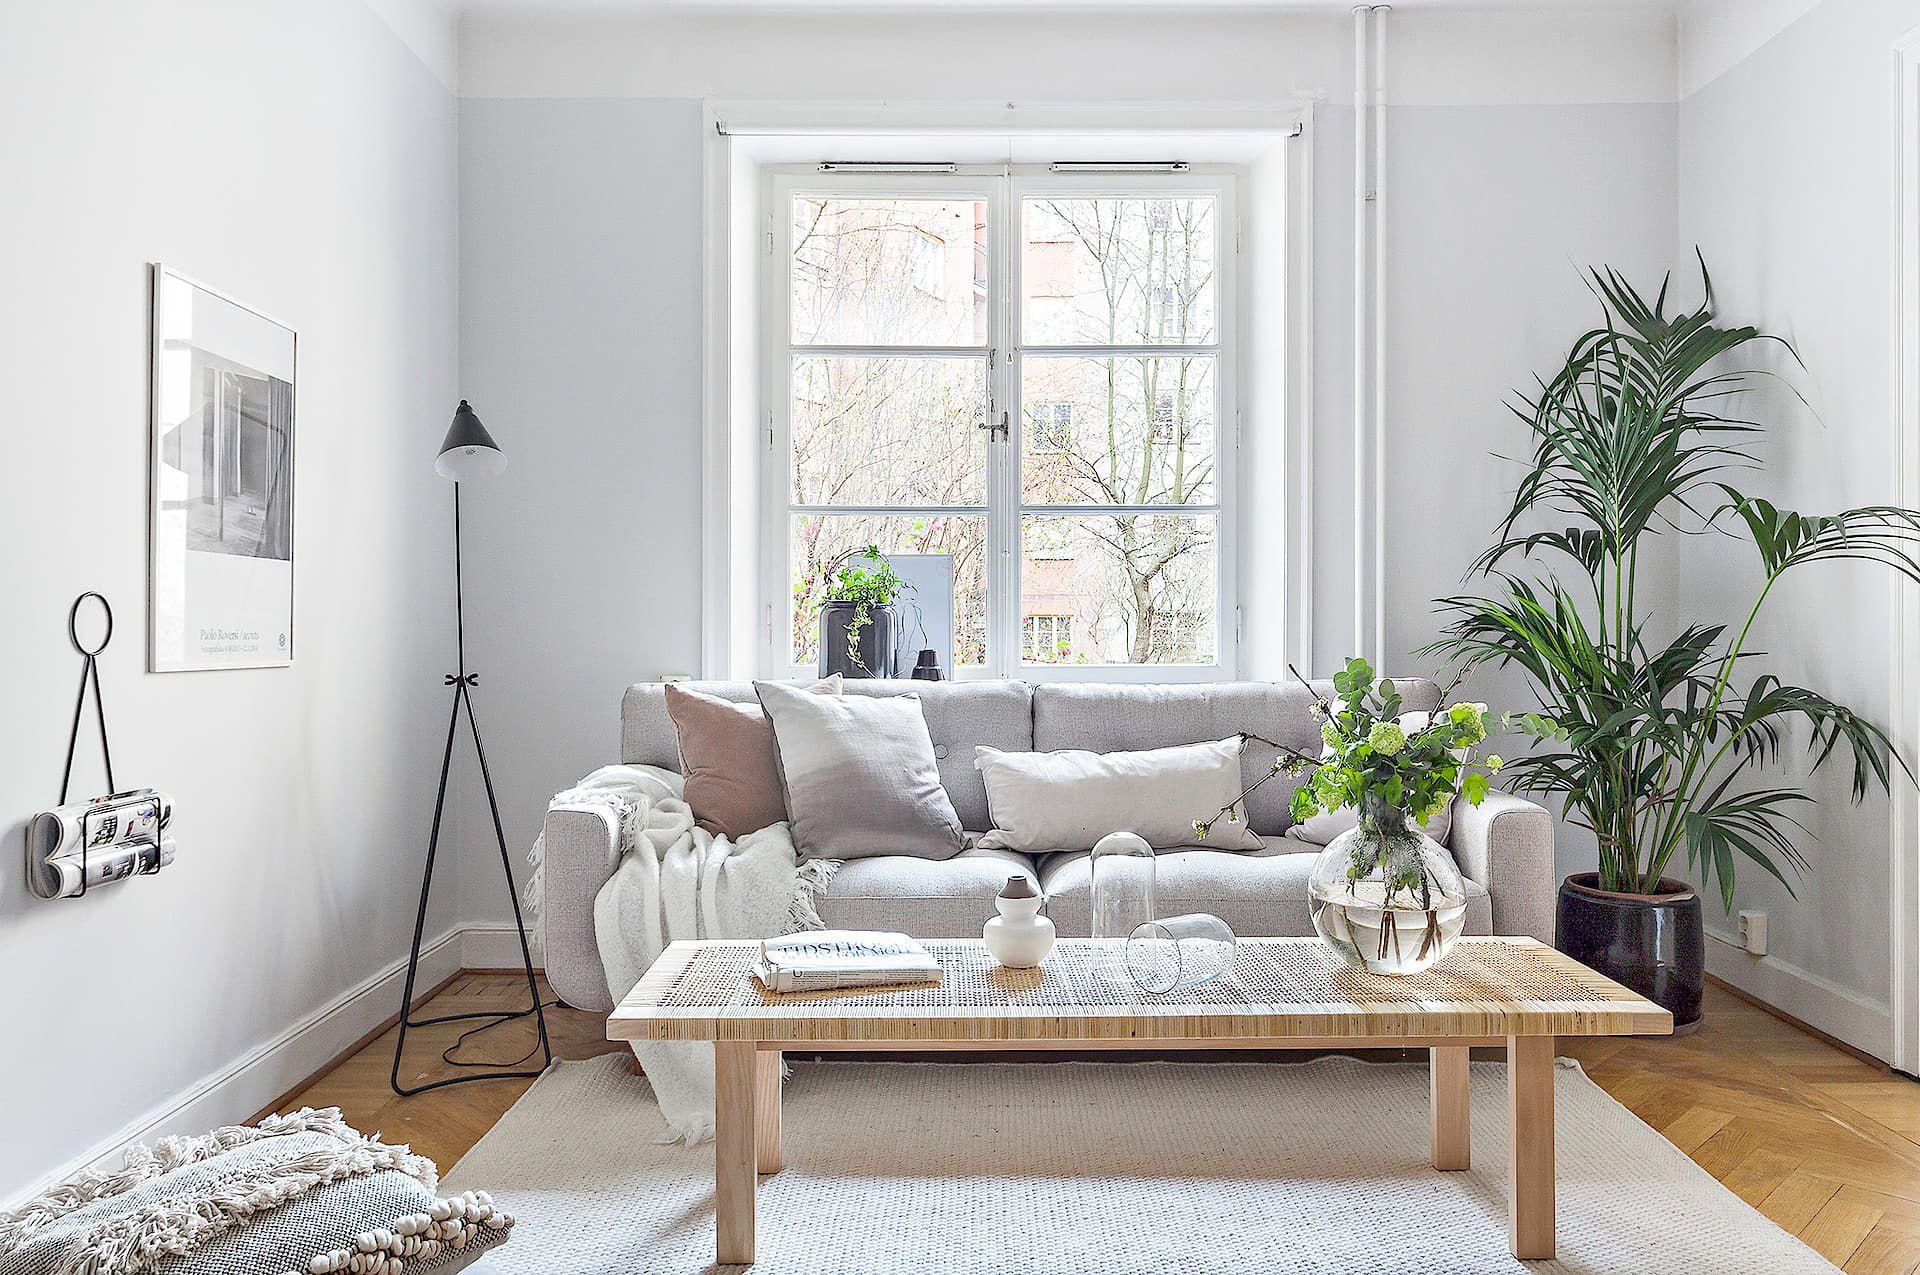 Ikea ustockholm u bench as a coffee table home decor